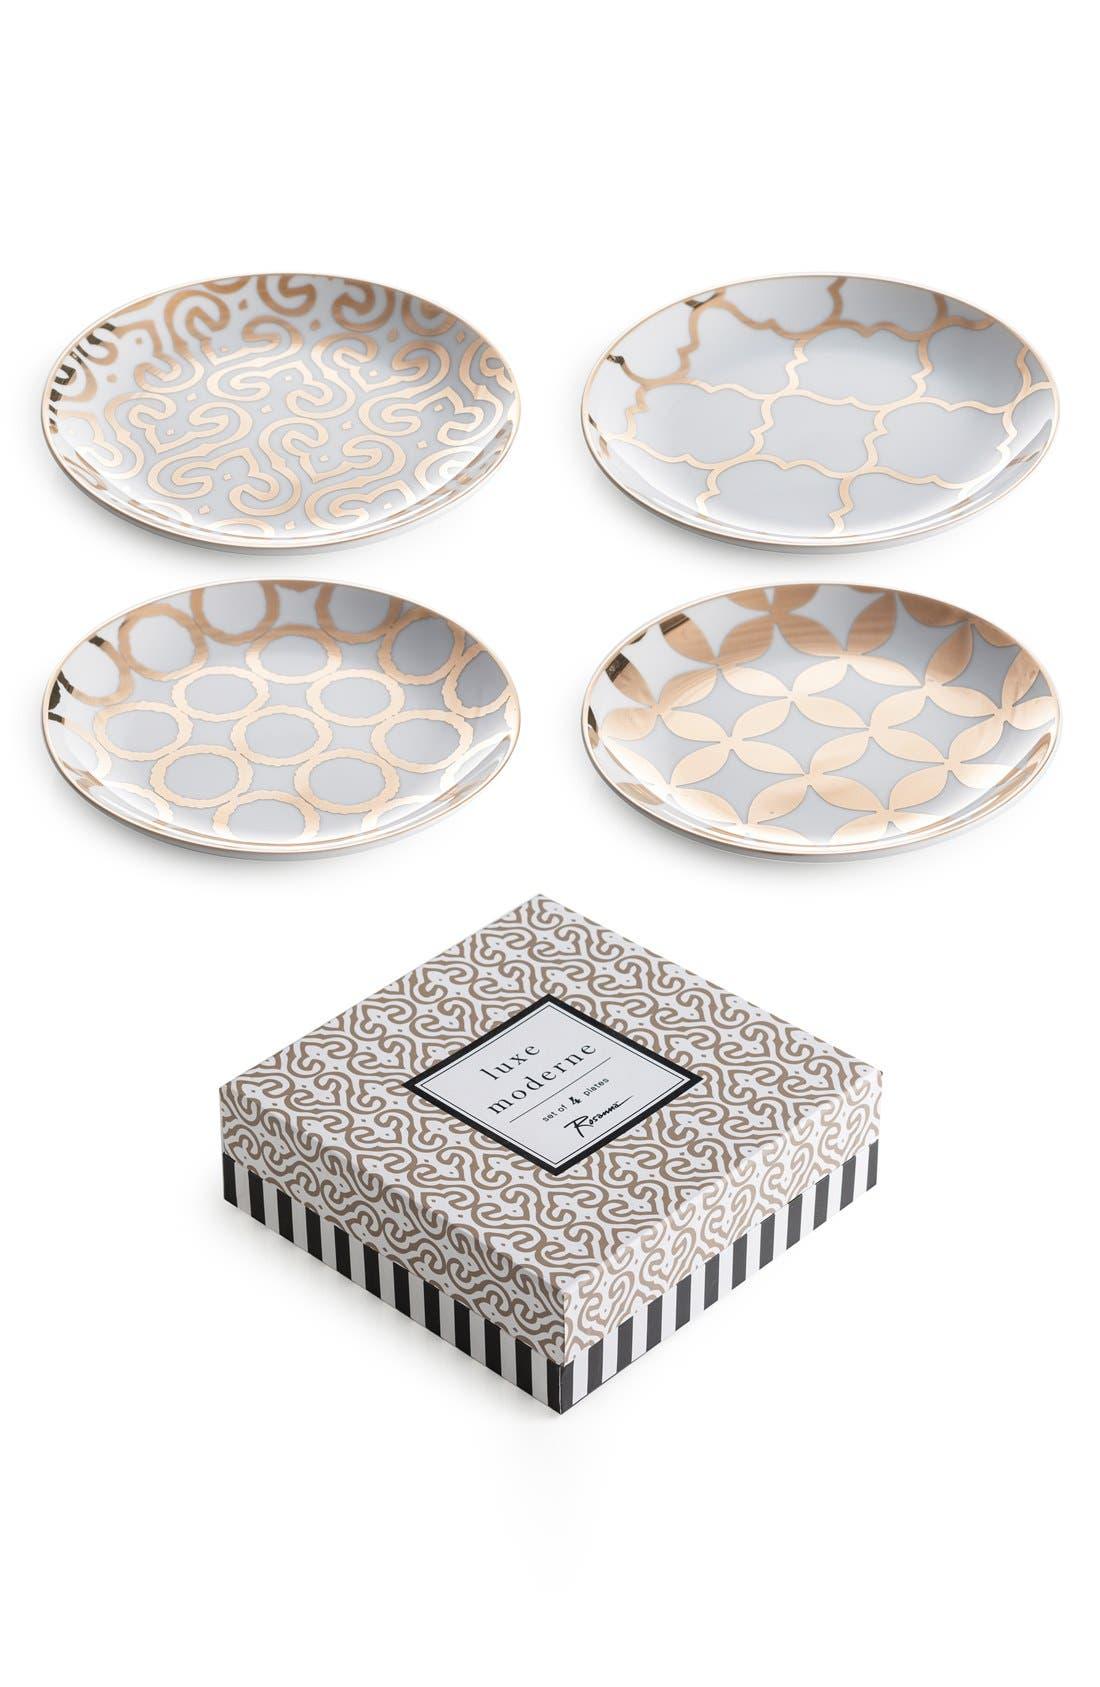 Rosanna 'Luxe Moderne' Appetizer Plates (Set of 4)